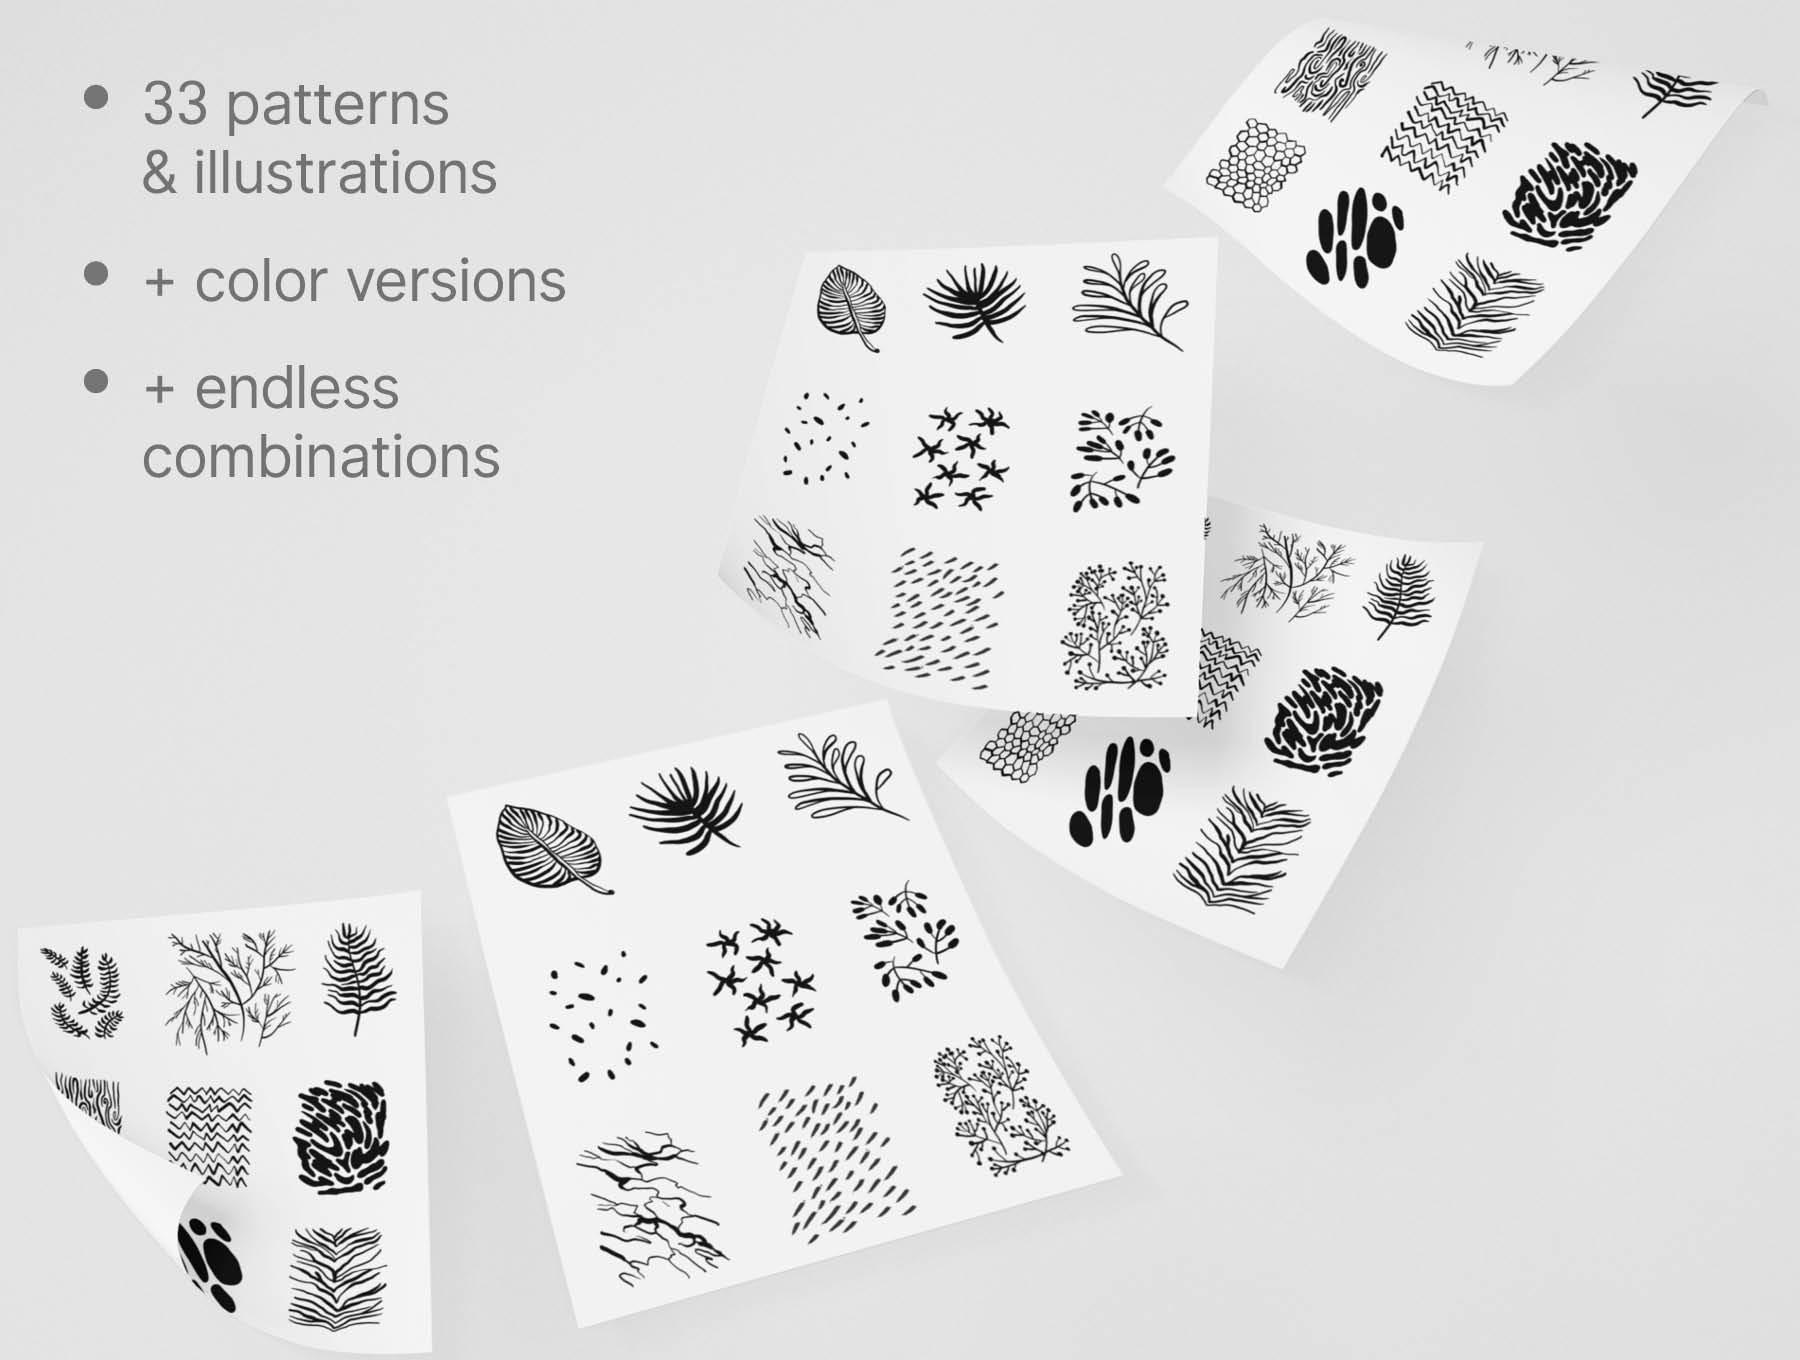 patterny26_1585932343166